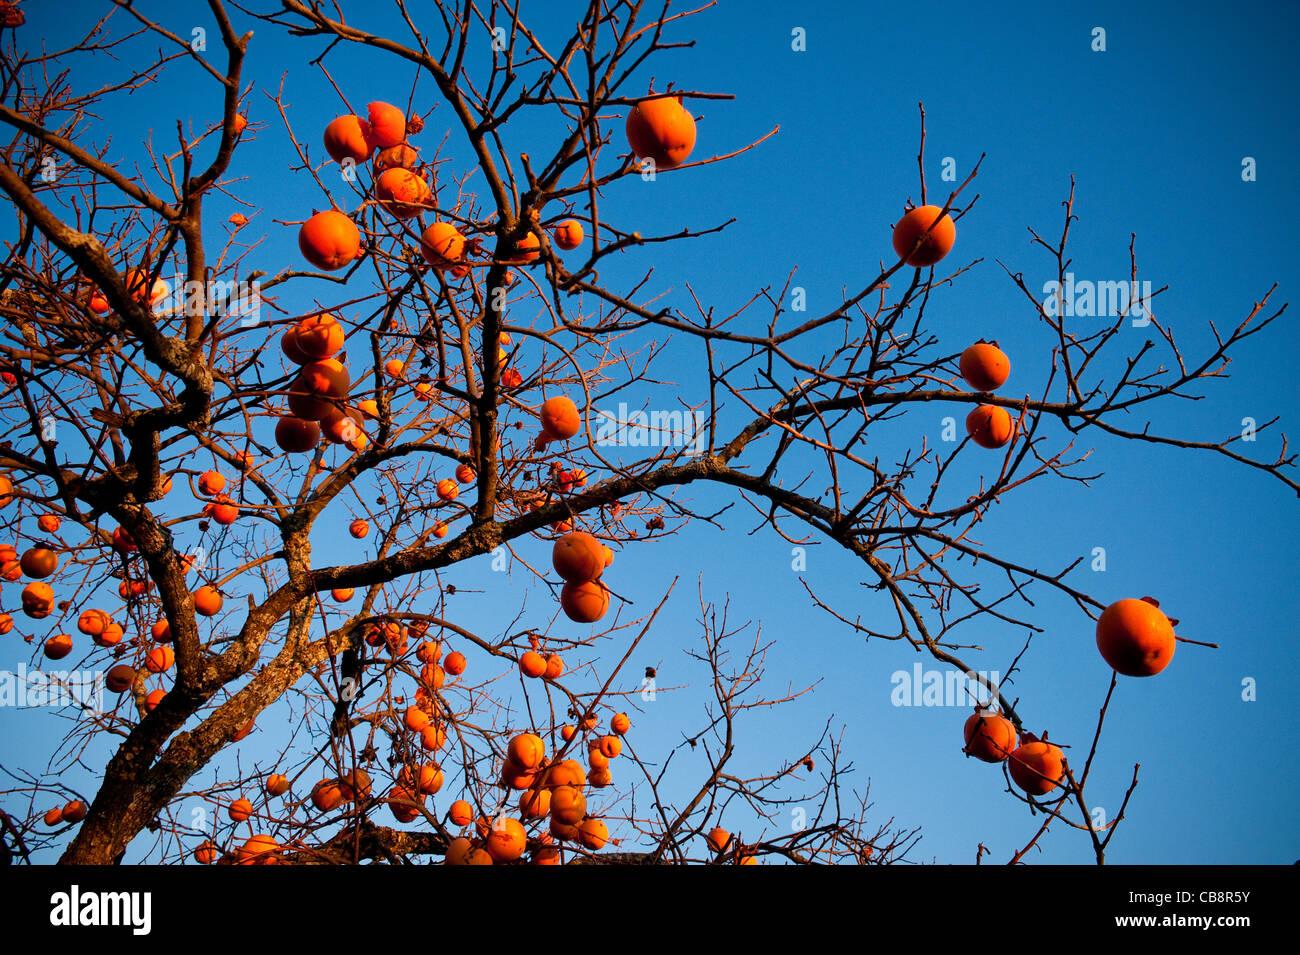 Persimmon fruit tree, in late autumn, Umbria, Italy - Stock Image